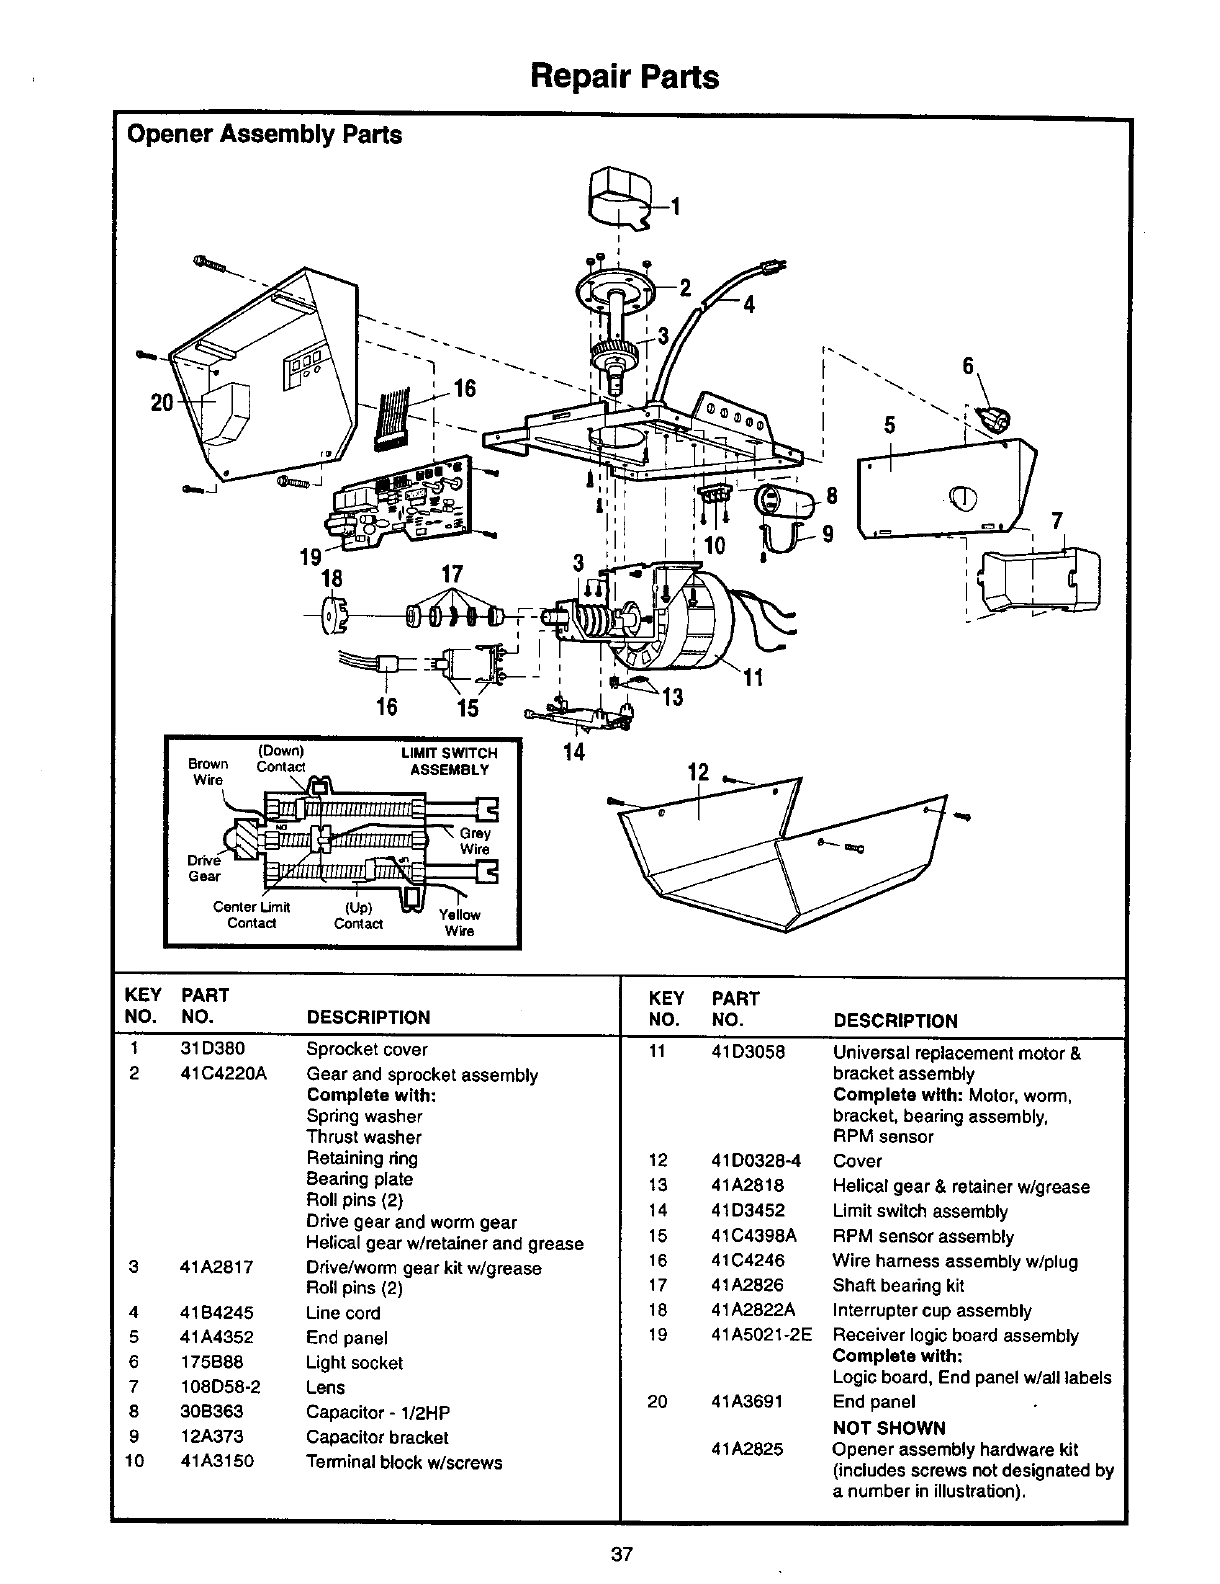 Craftsman 1 2 Hp 139 53978Srt Users Manual